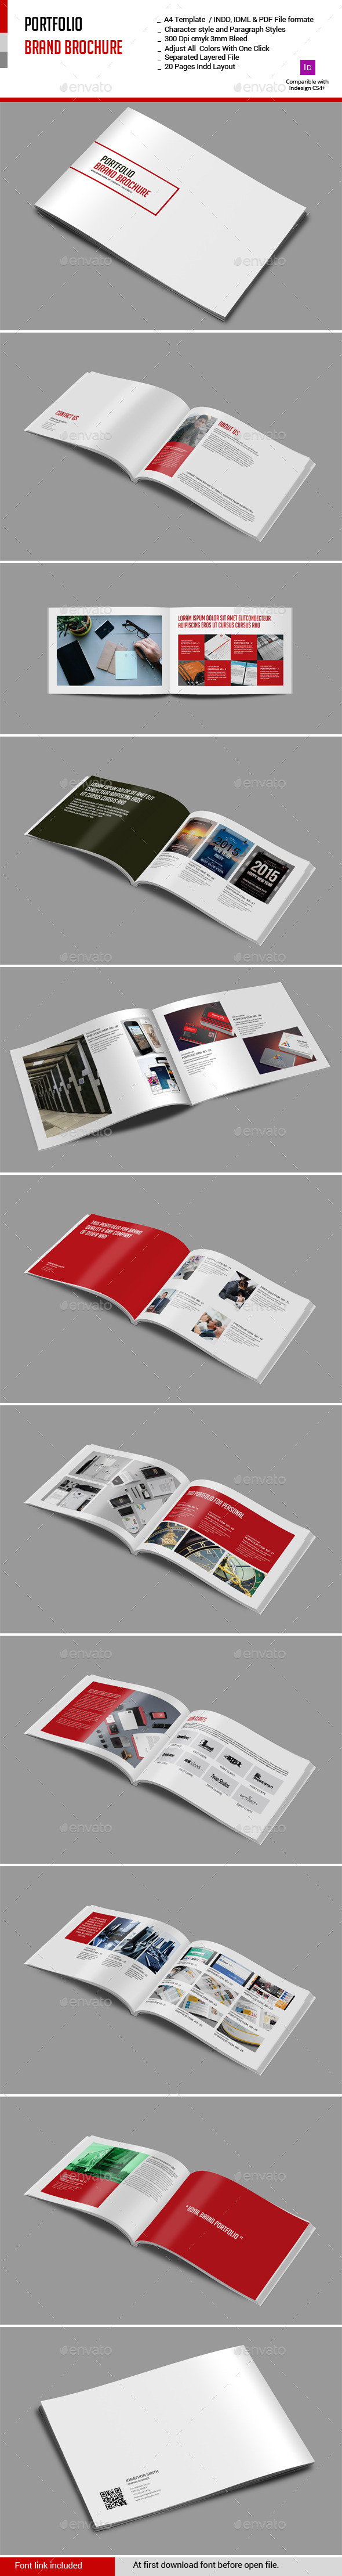 GraphicRiver Portfolio Brand Brochure 10974788